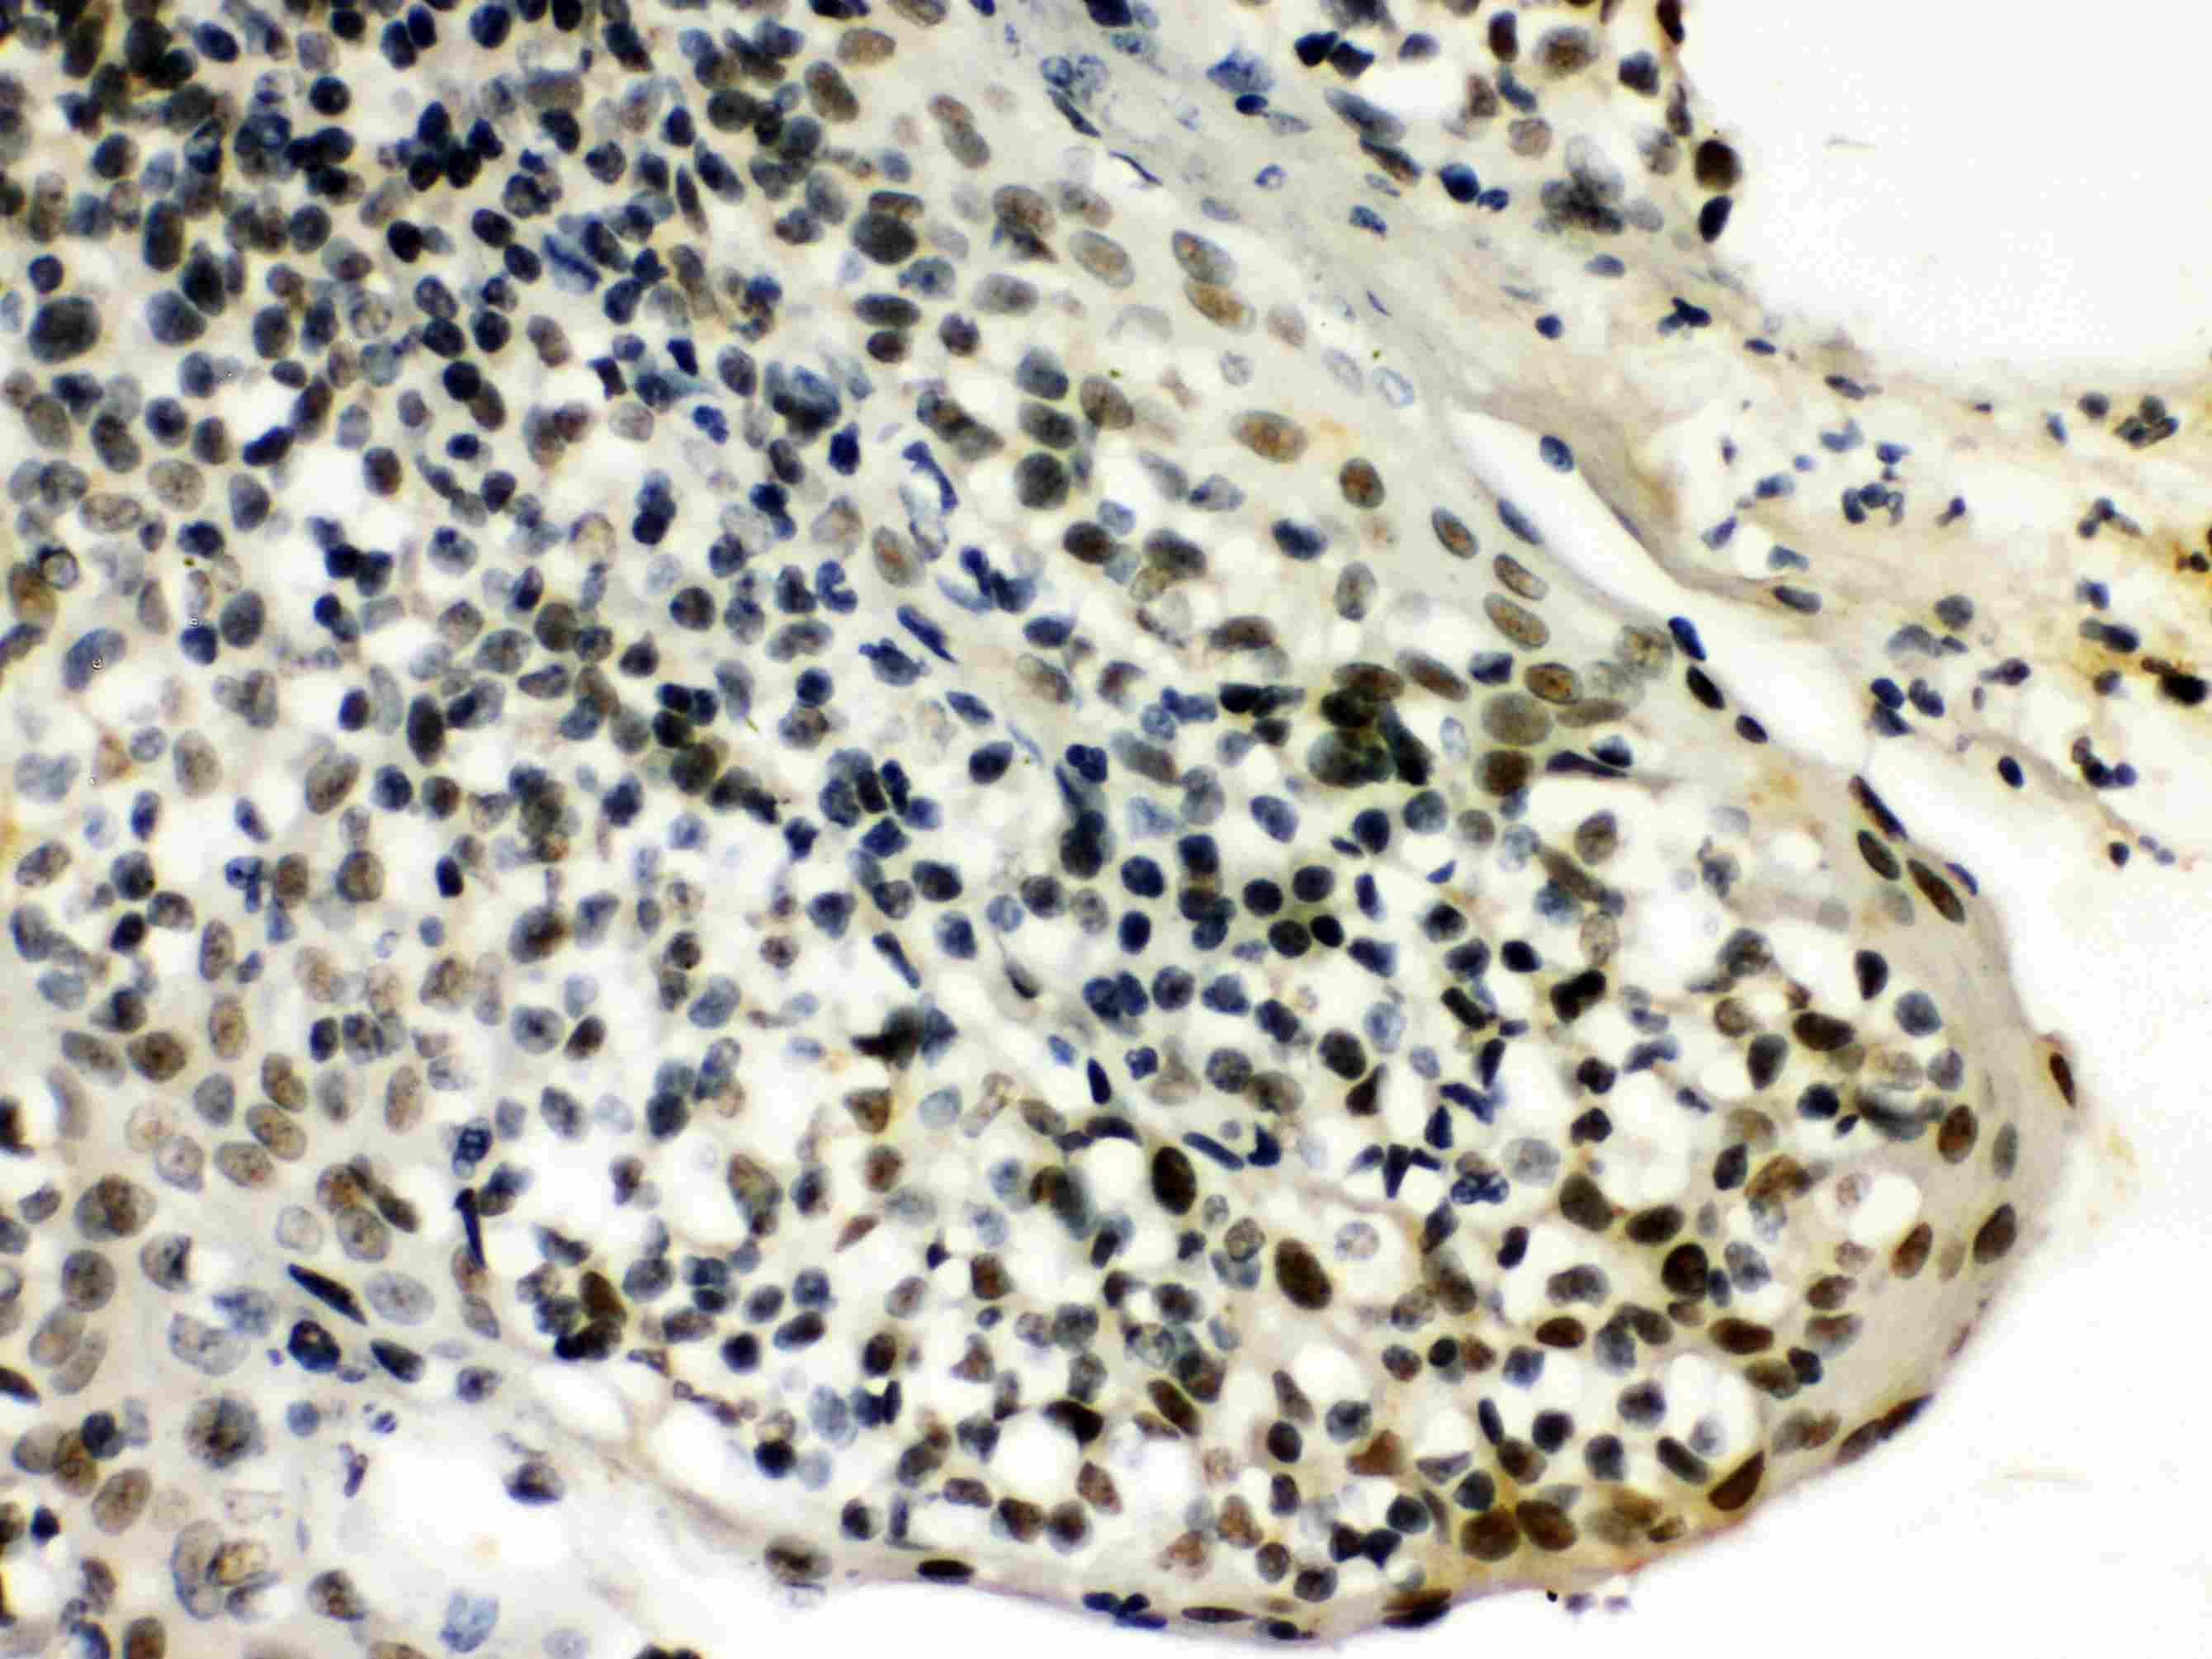 SNRPN Antibody in Immunohistochemistry (Paraffin) (IHC (P))